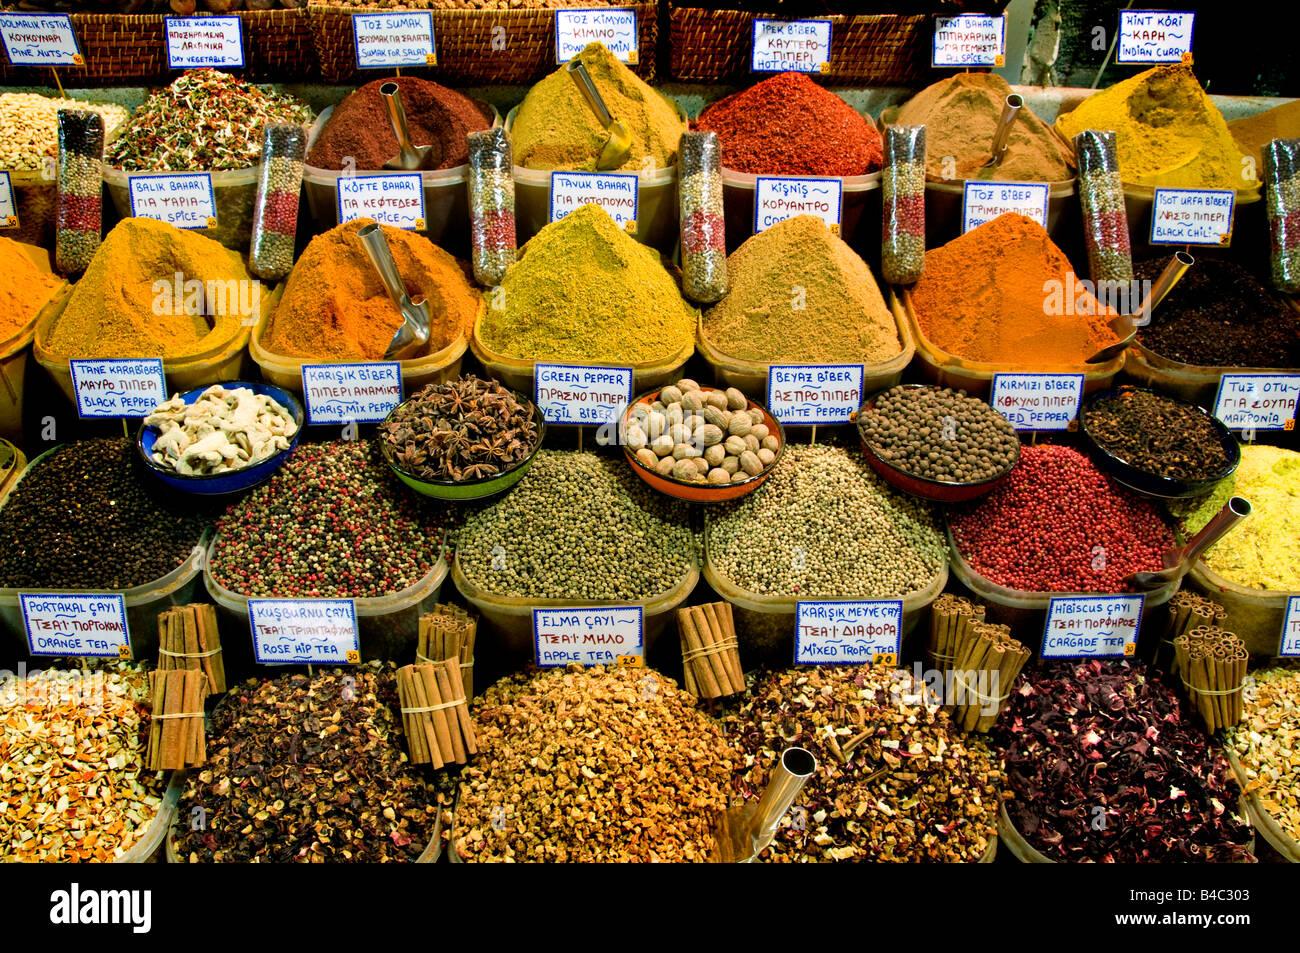 Istanbul The Spice Bazaar Mısır Carsısı or Egyptian Bazaar  is one of the oldest bazaars in the city. - Stock Image